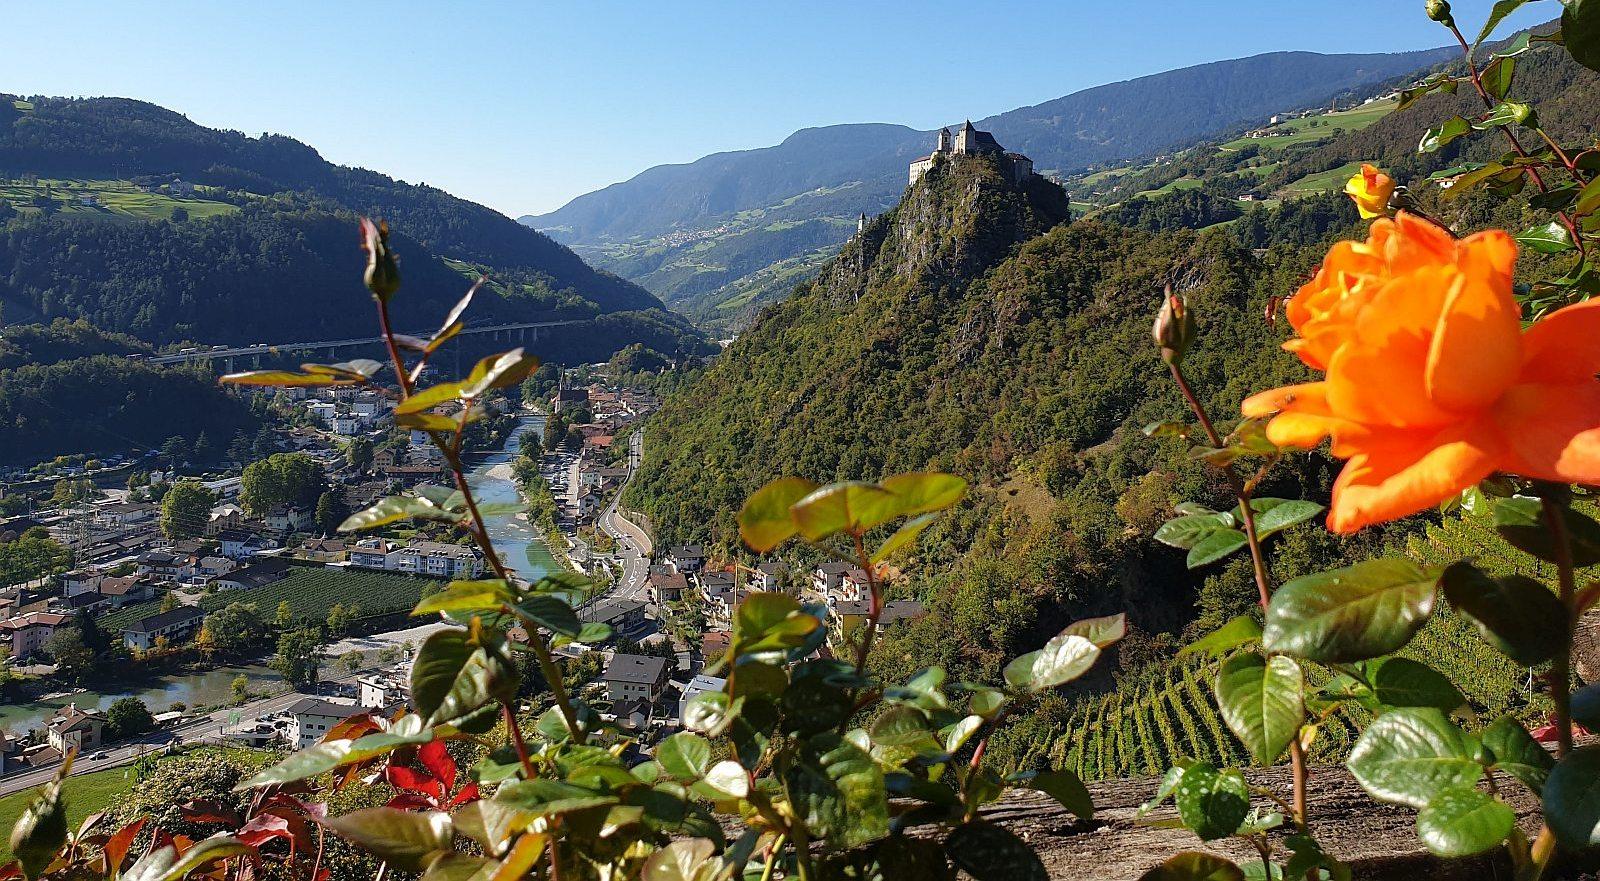 Direktorstag in Südtirol